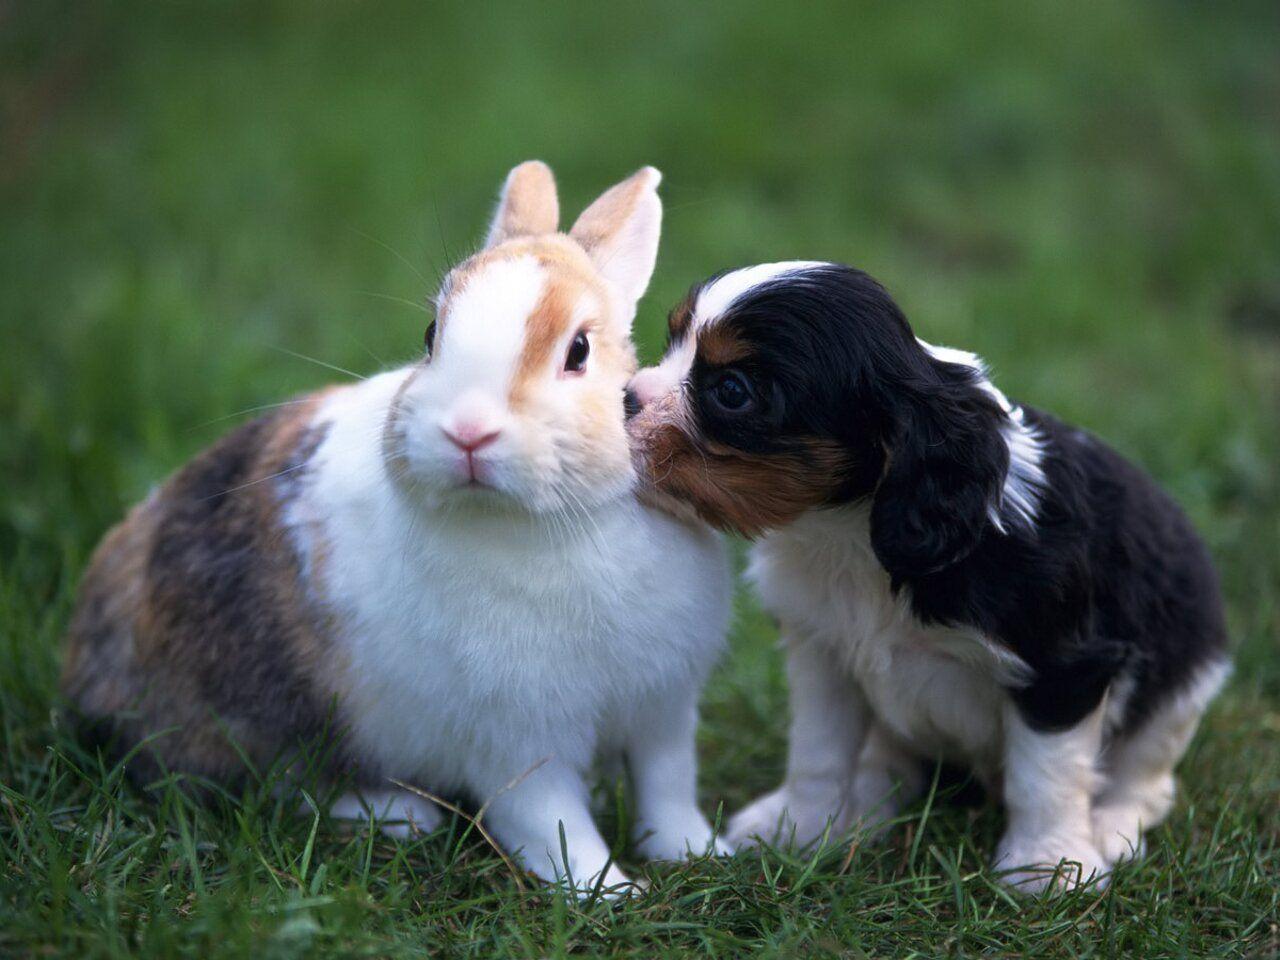 Too Cute Animals Friends King Charles Cavalier Spaniel Puppy